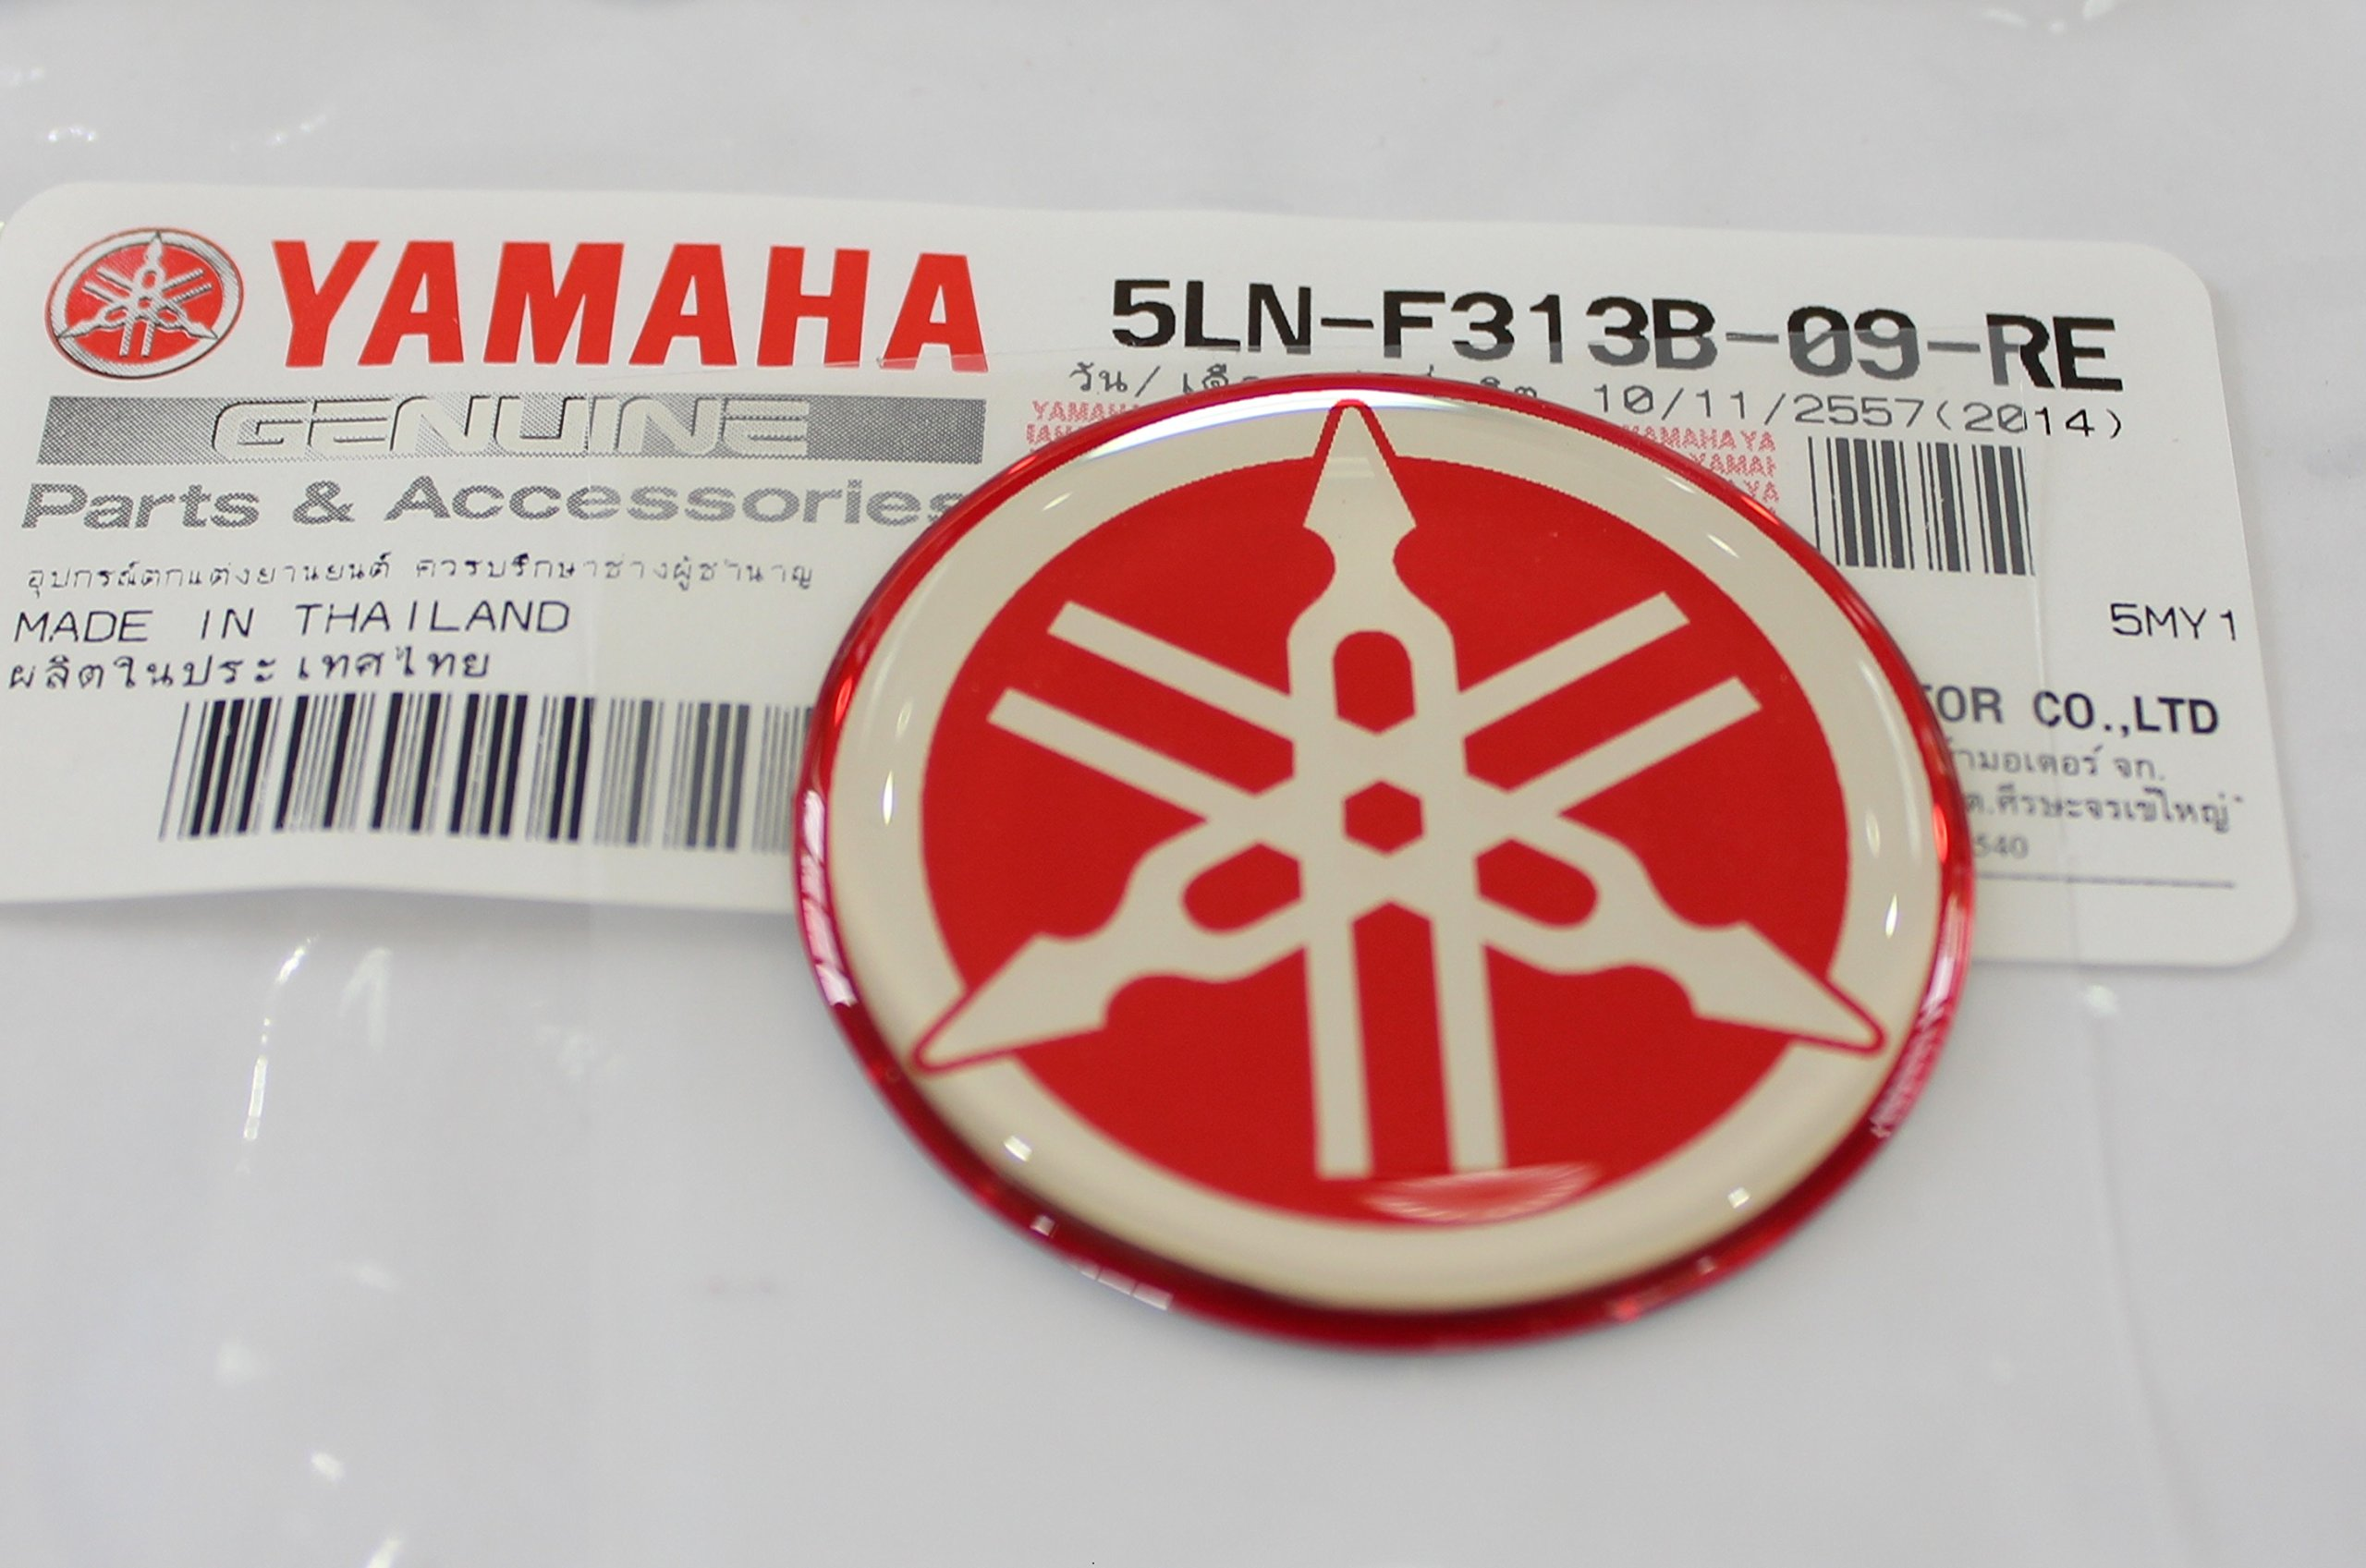 100/% GENUINE 55mm Diameter YAMAHA TUNING FORK Decal Sticker Emblem Logo BLACK Snowmobile Jet Ski ATV SILVER Raised Domed Metal Alloy Construction Self Adhesive Motorcycle